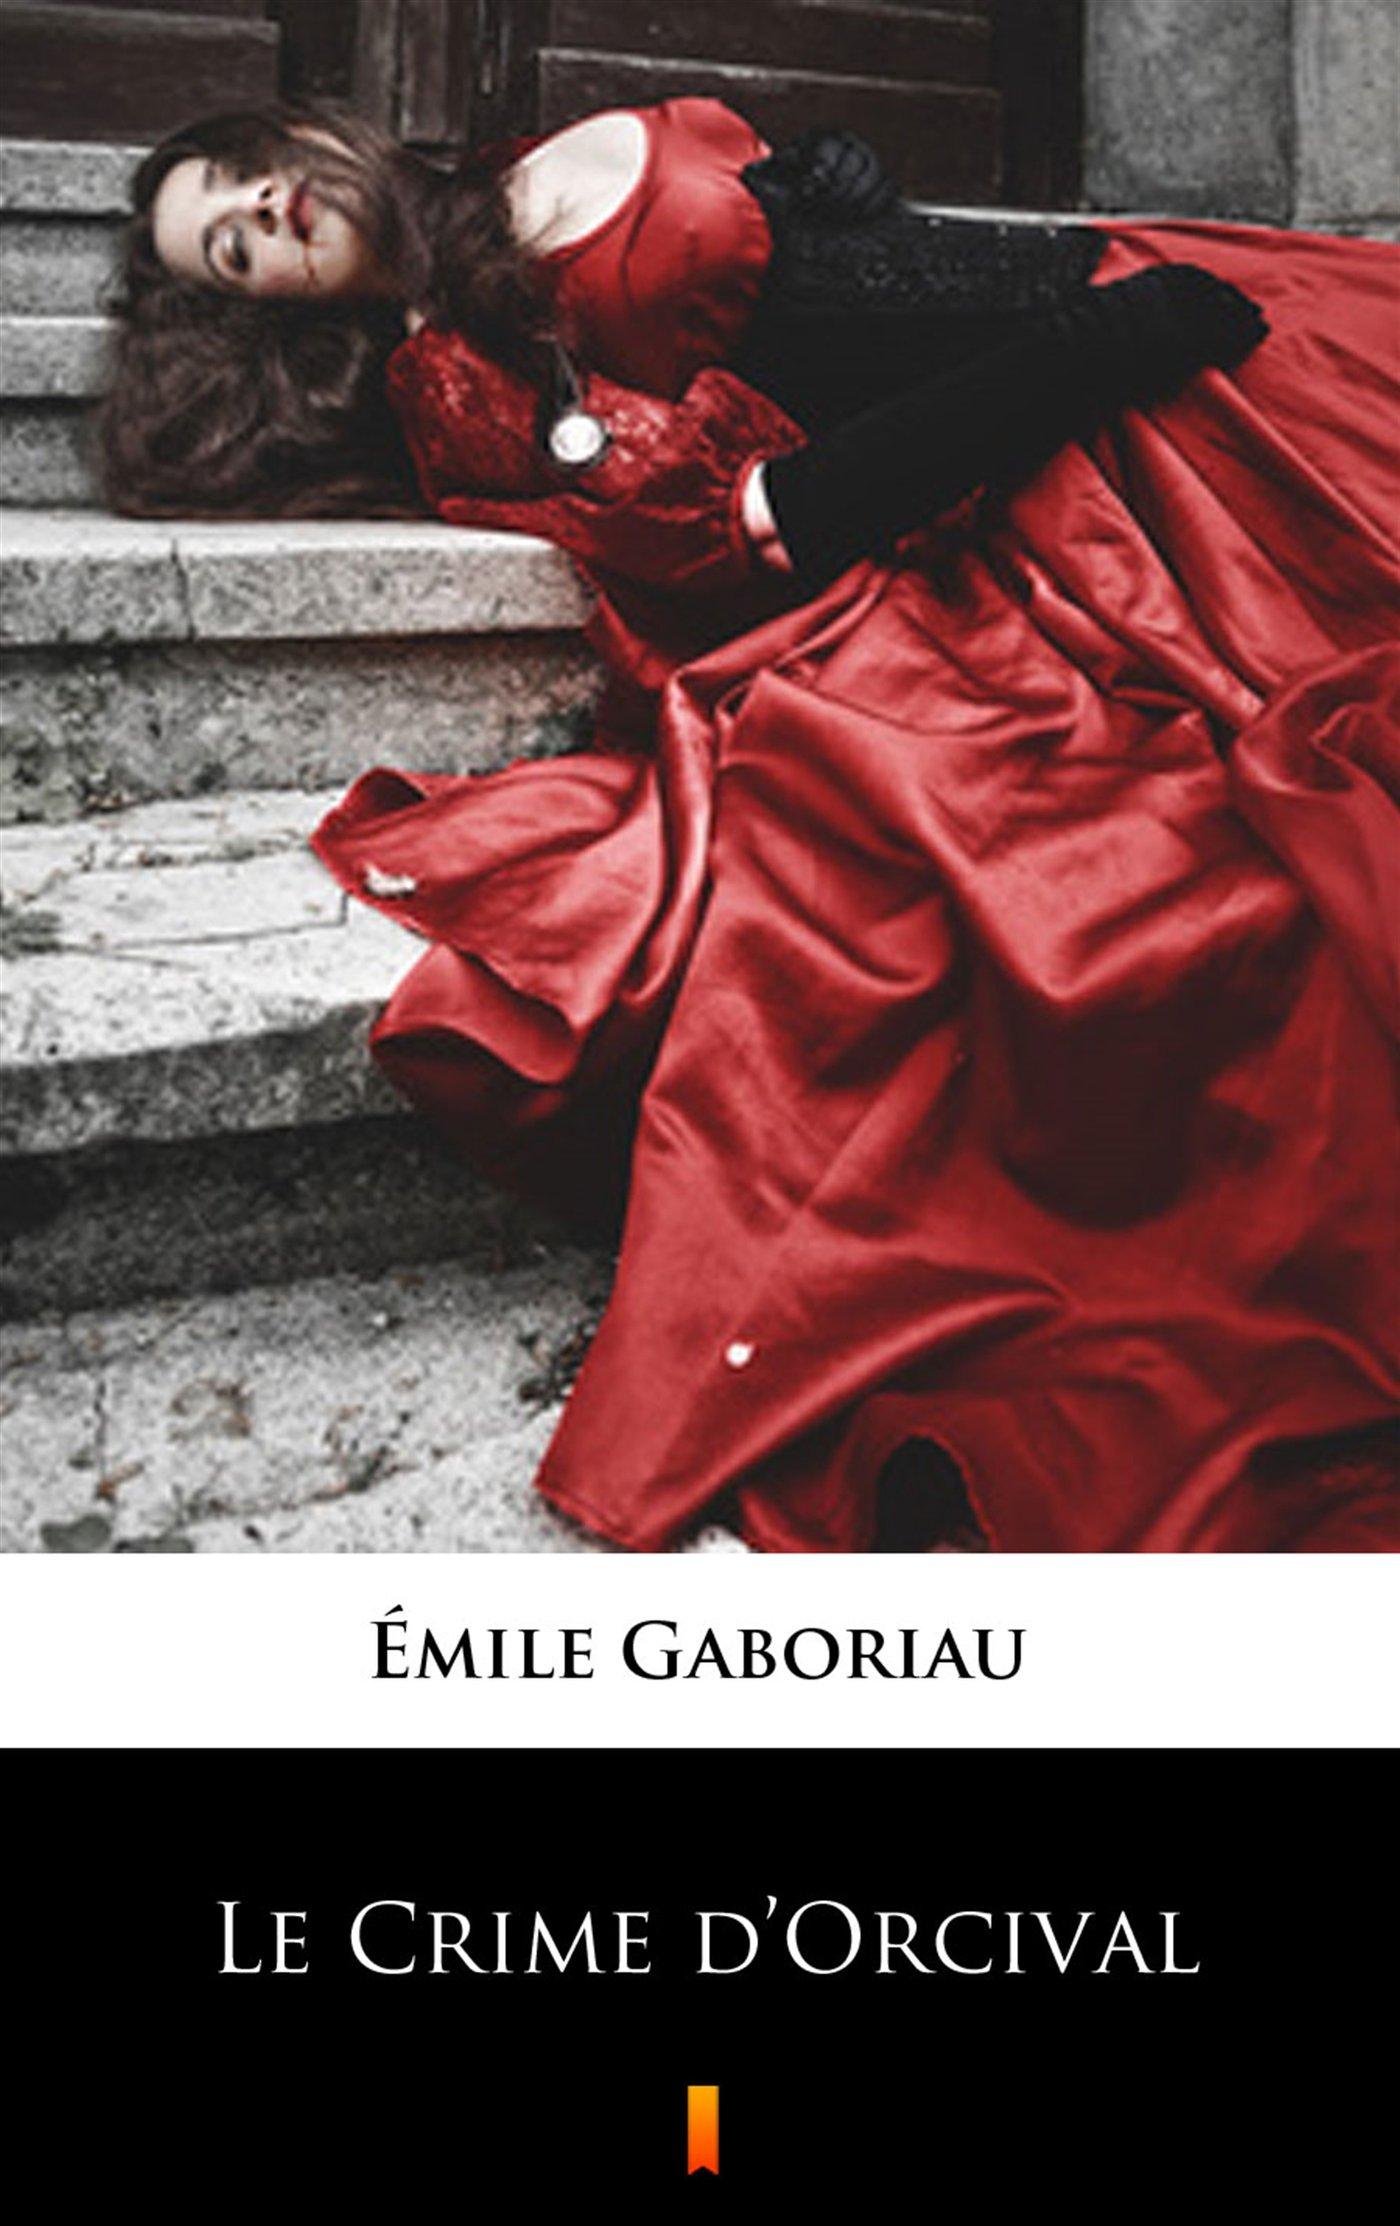 Le Crime d'Orcival - Ebook (Książka EPUB) do pobrania w formacie EPUB